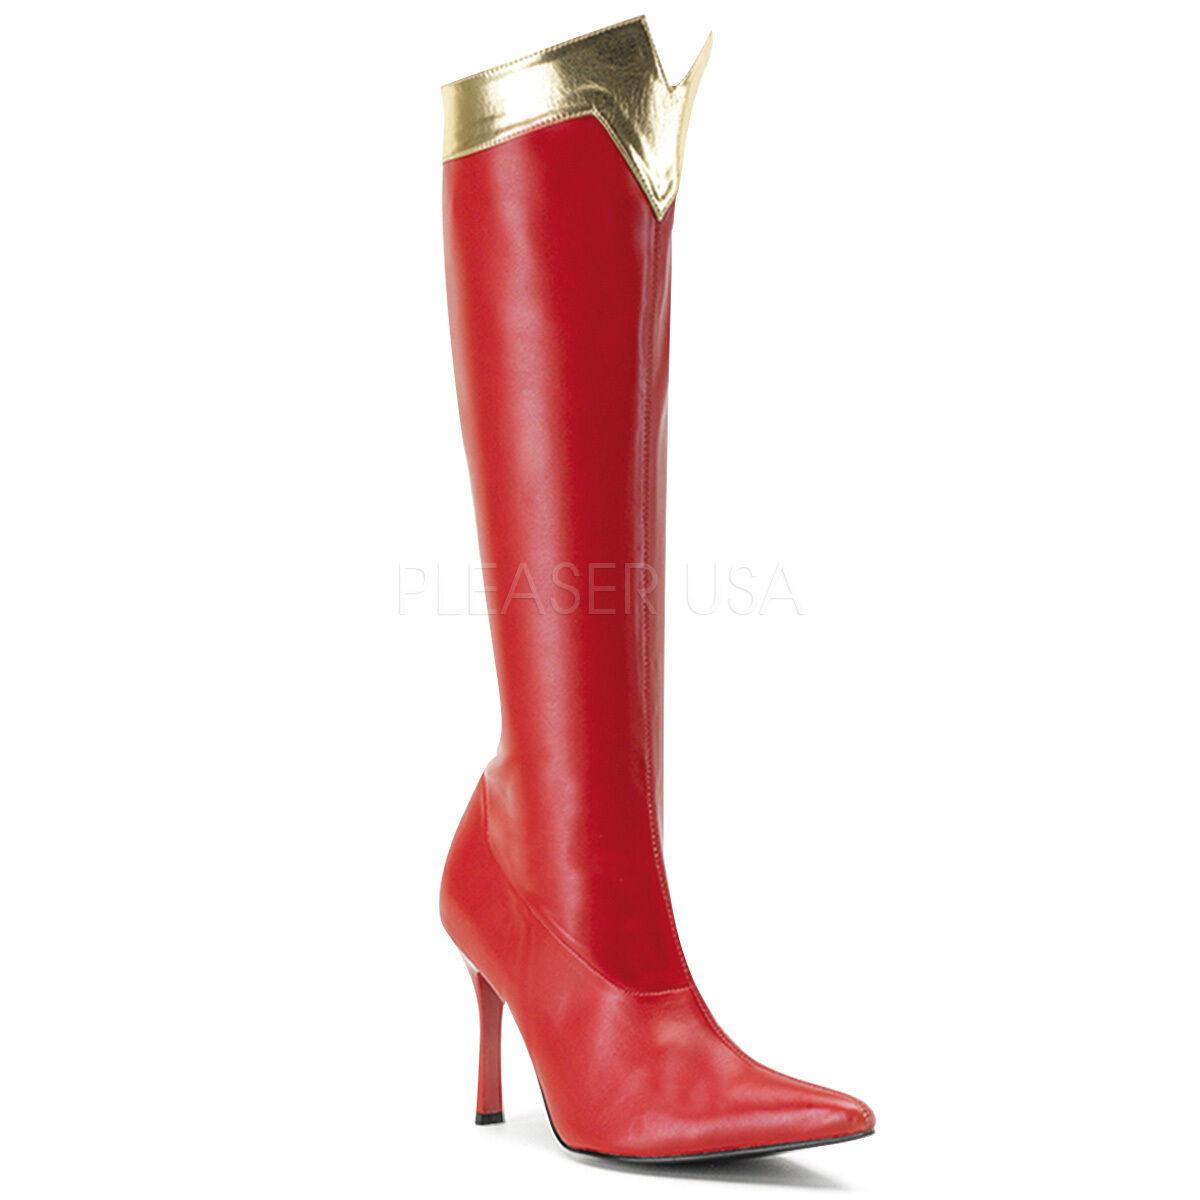 PLEASER FUNTASMA Wonder-130 ROT/Gold Stretch Fancy Dress Wonder Woman Knee Stiefel